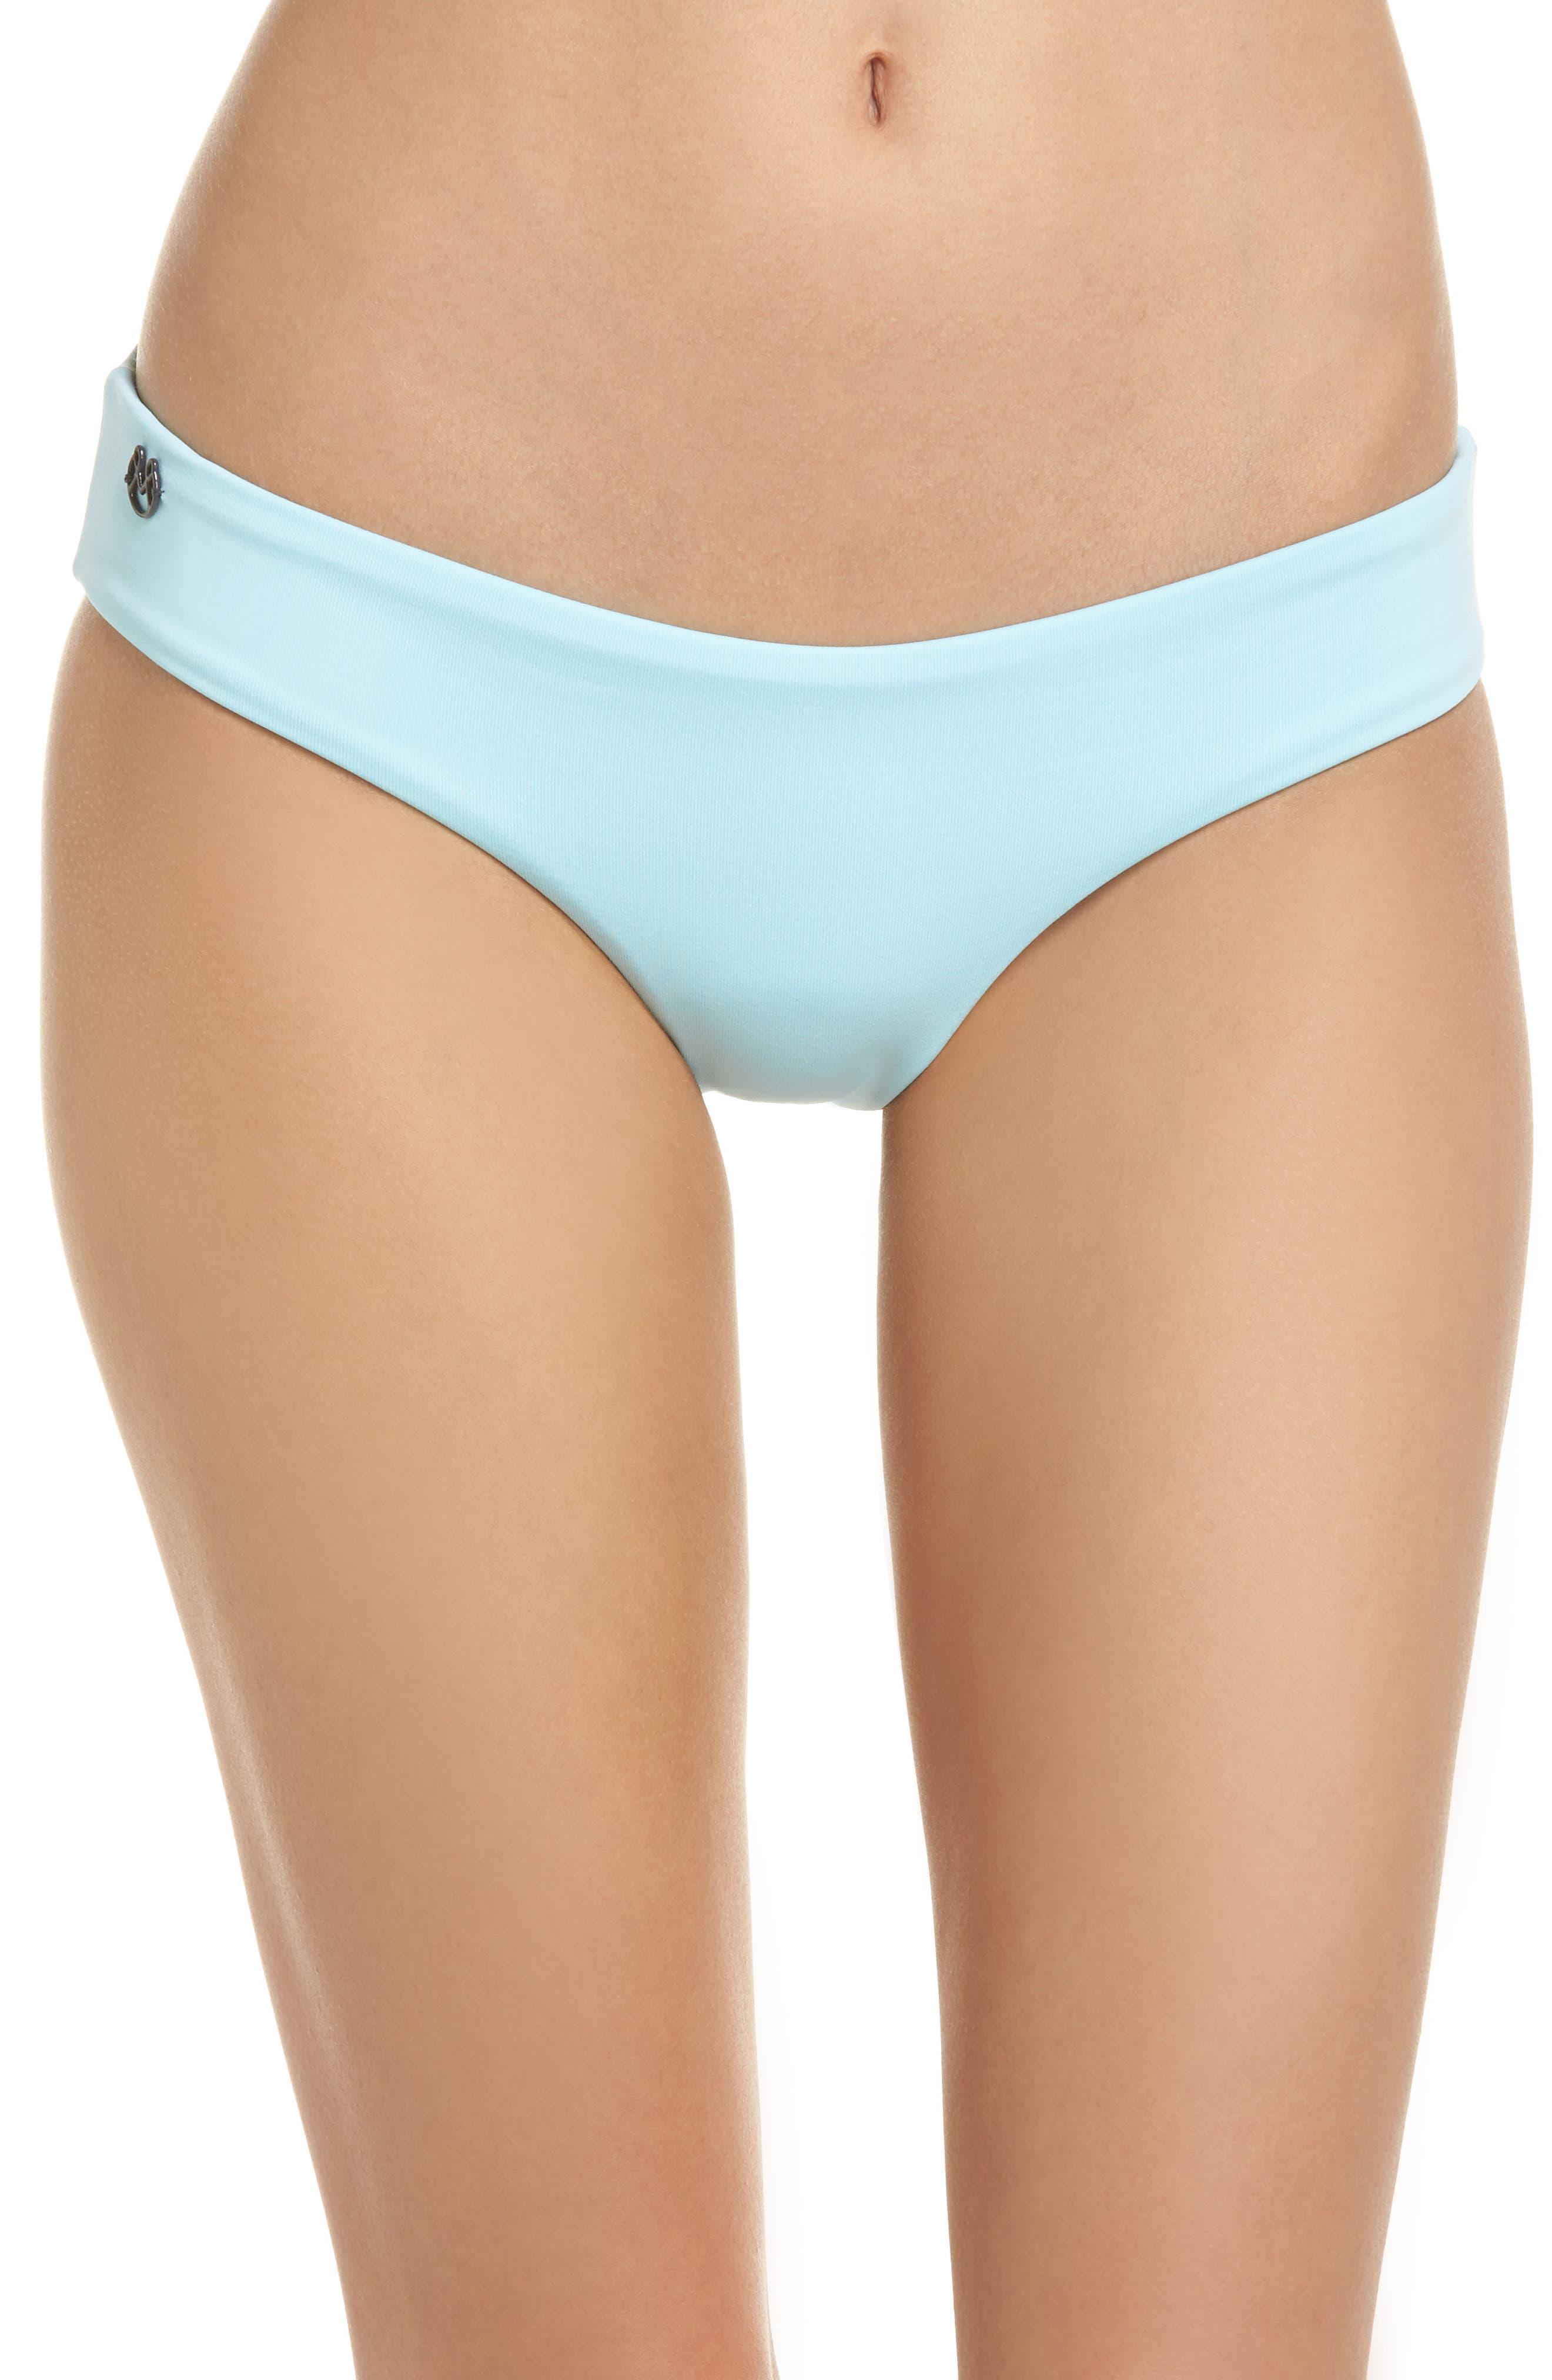 Crystal Blue Sublime Signature Reversible Bikini Bottoms,                         Main,                         color, 450